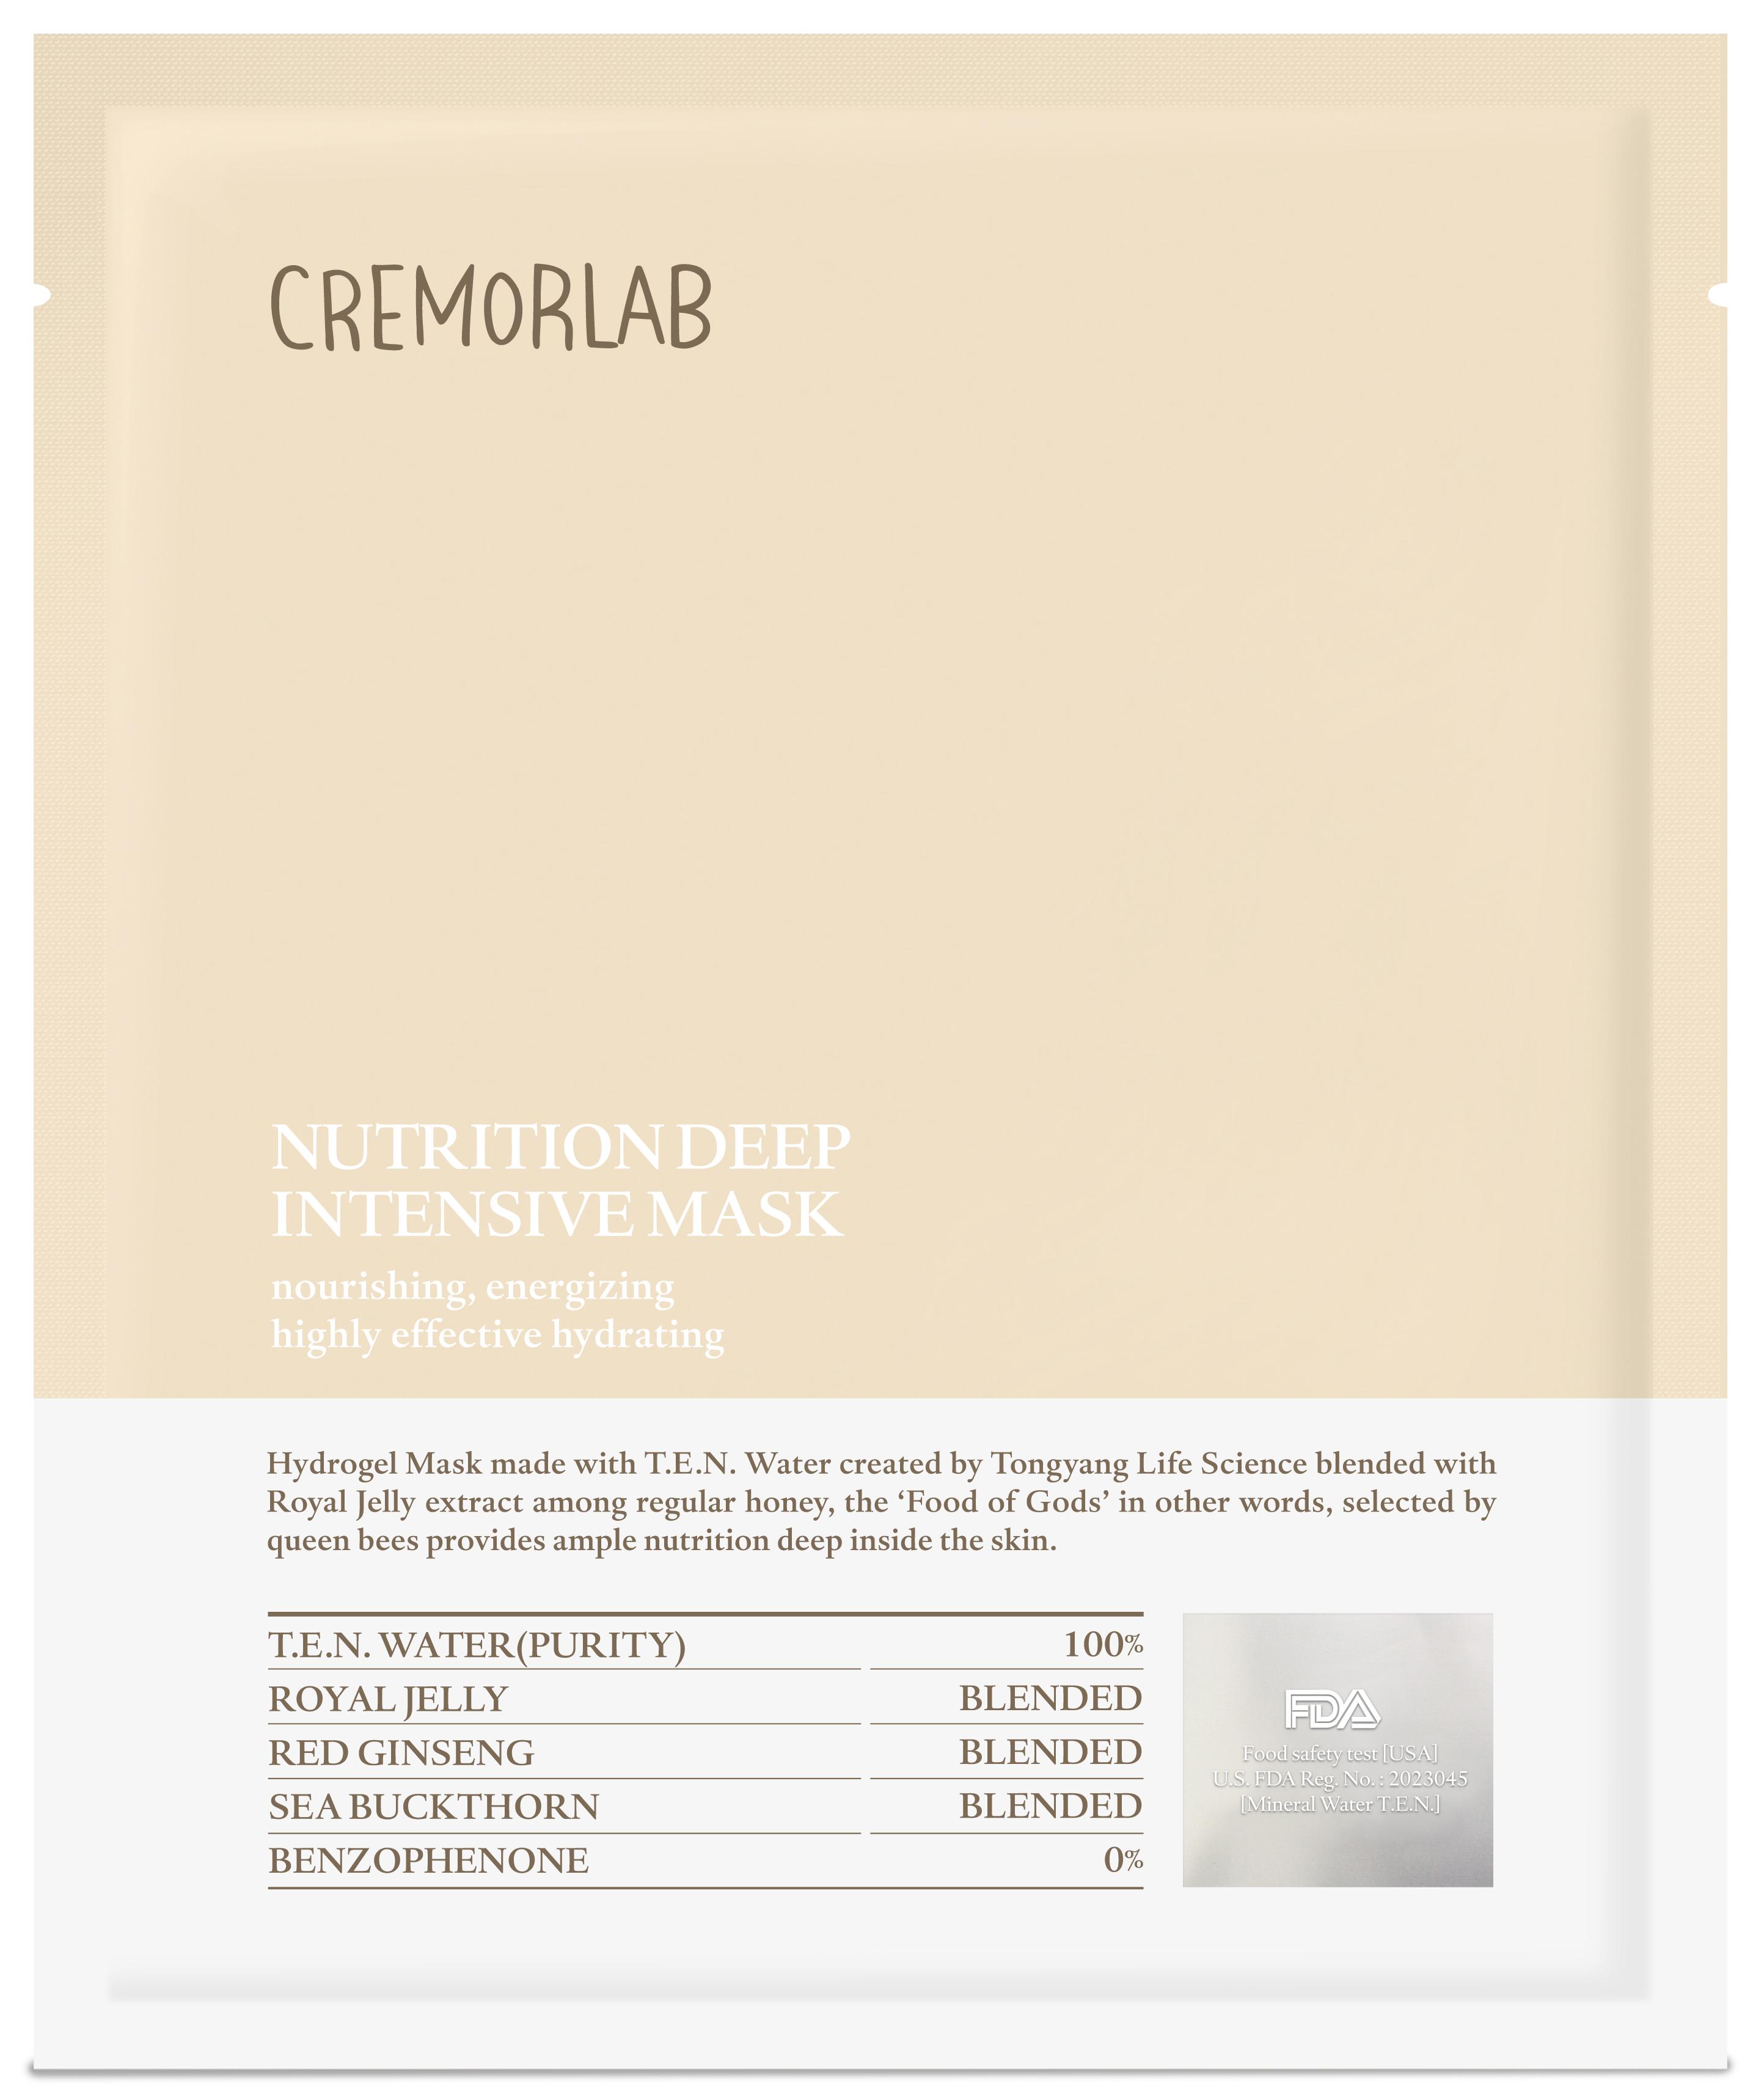 Cremorlab Cremorlab Nutrition Cremorlab Cremorlab Nutrition Deep Intensive Mask  90573477